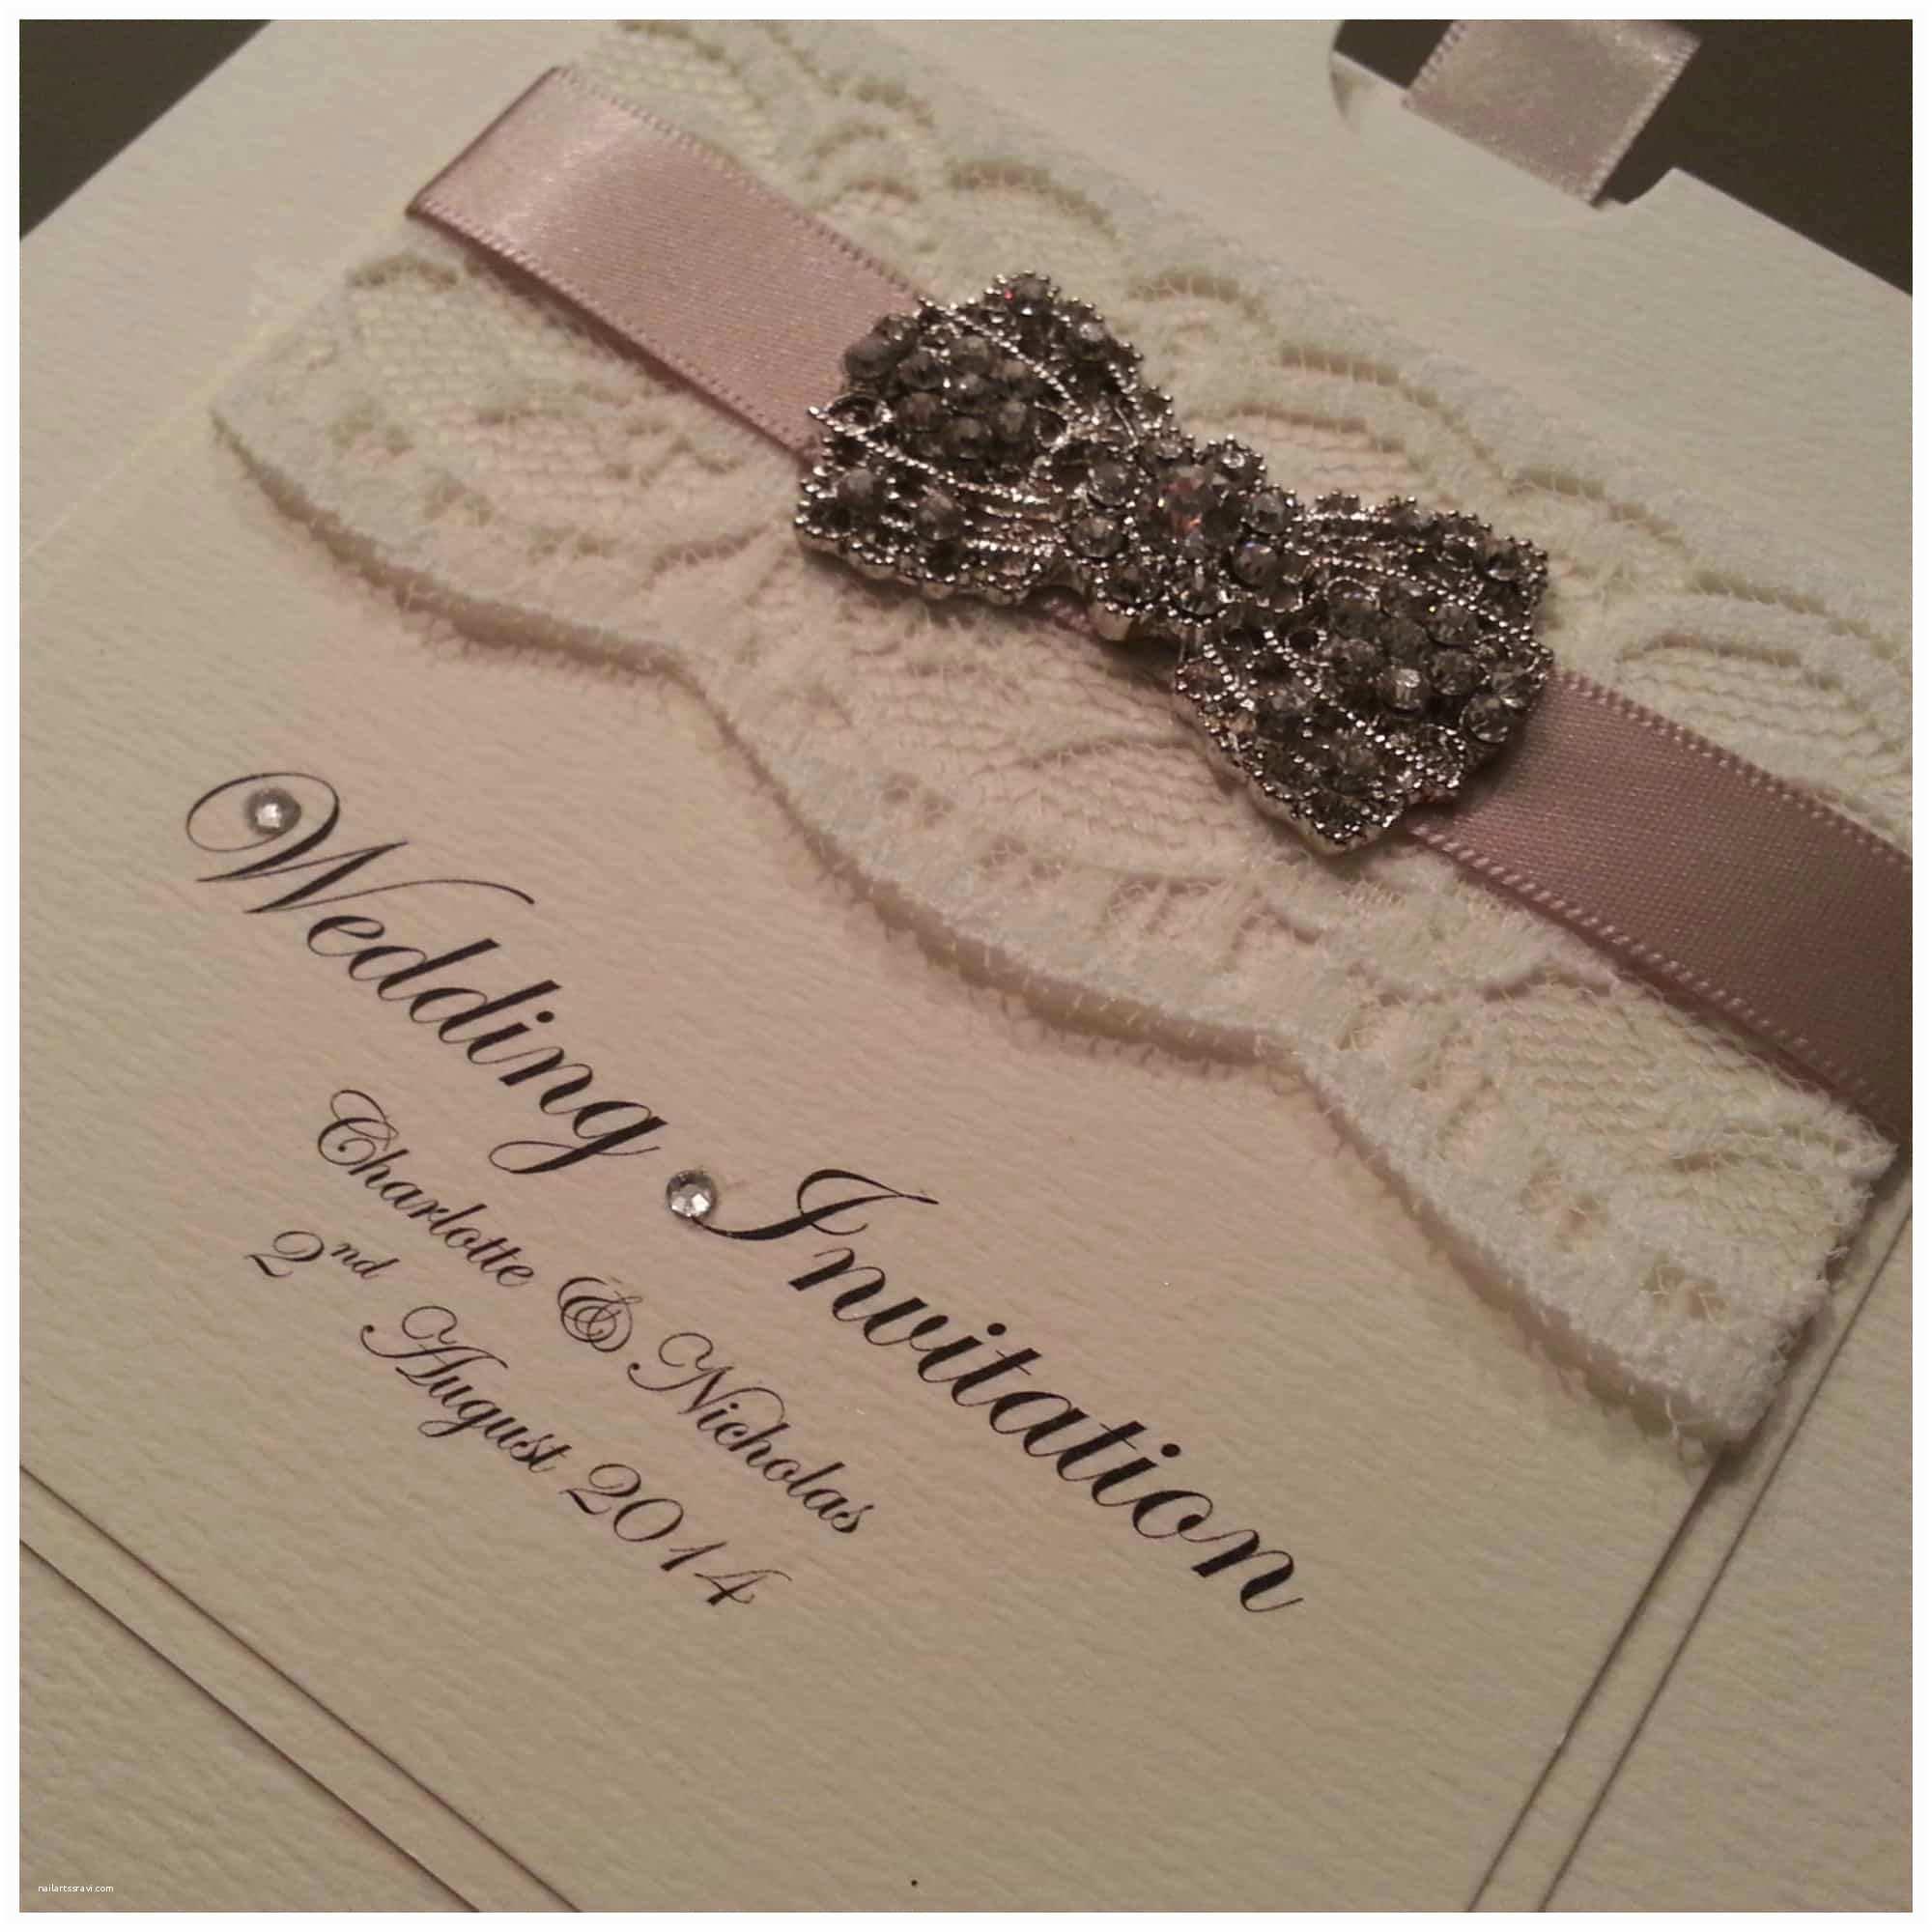 How to Design Wedding Invitations Tips Easy to Create Luxury Wedding Invitations Free